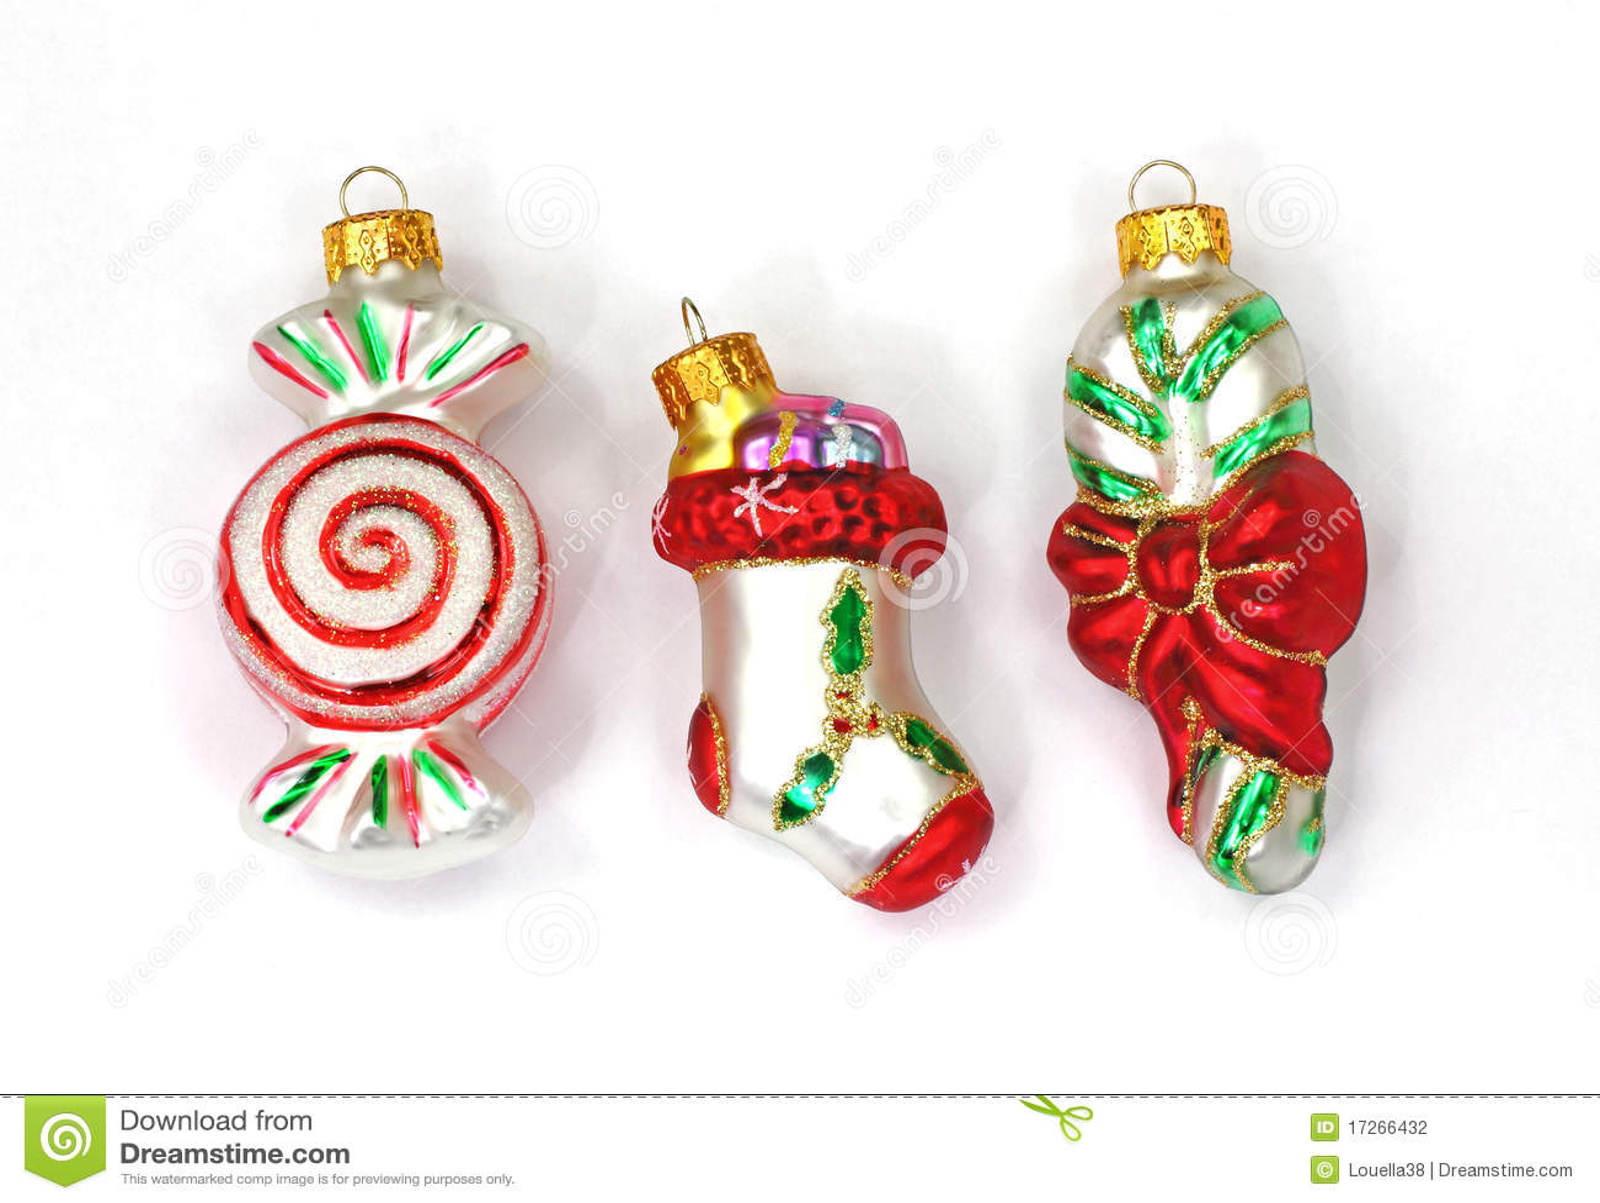 Miniature ornaments - Candy Stocking Sugar Cane Miniature Ornaments